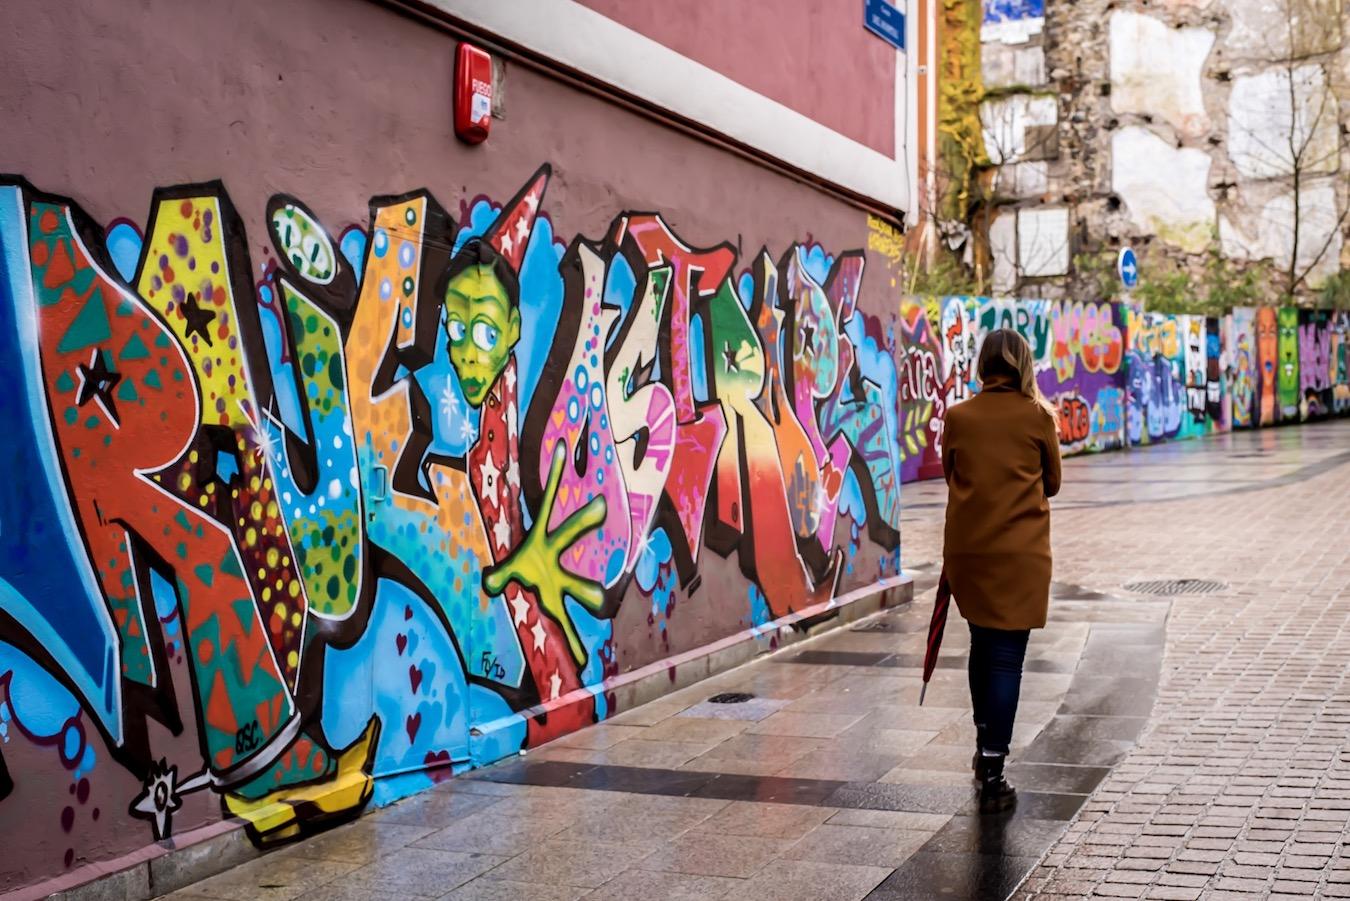 Street art in Santander, Northern Spain - by Ben Holbrook